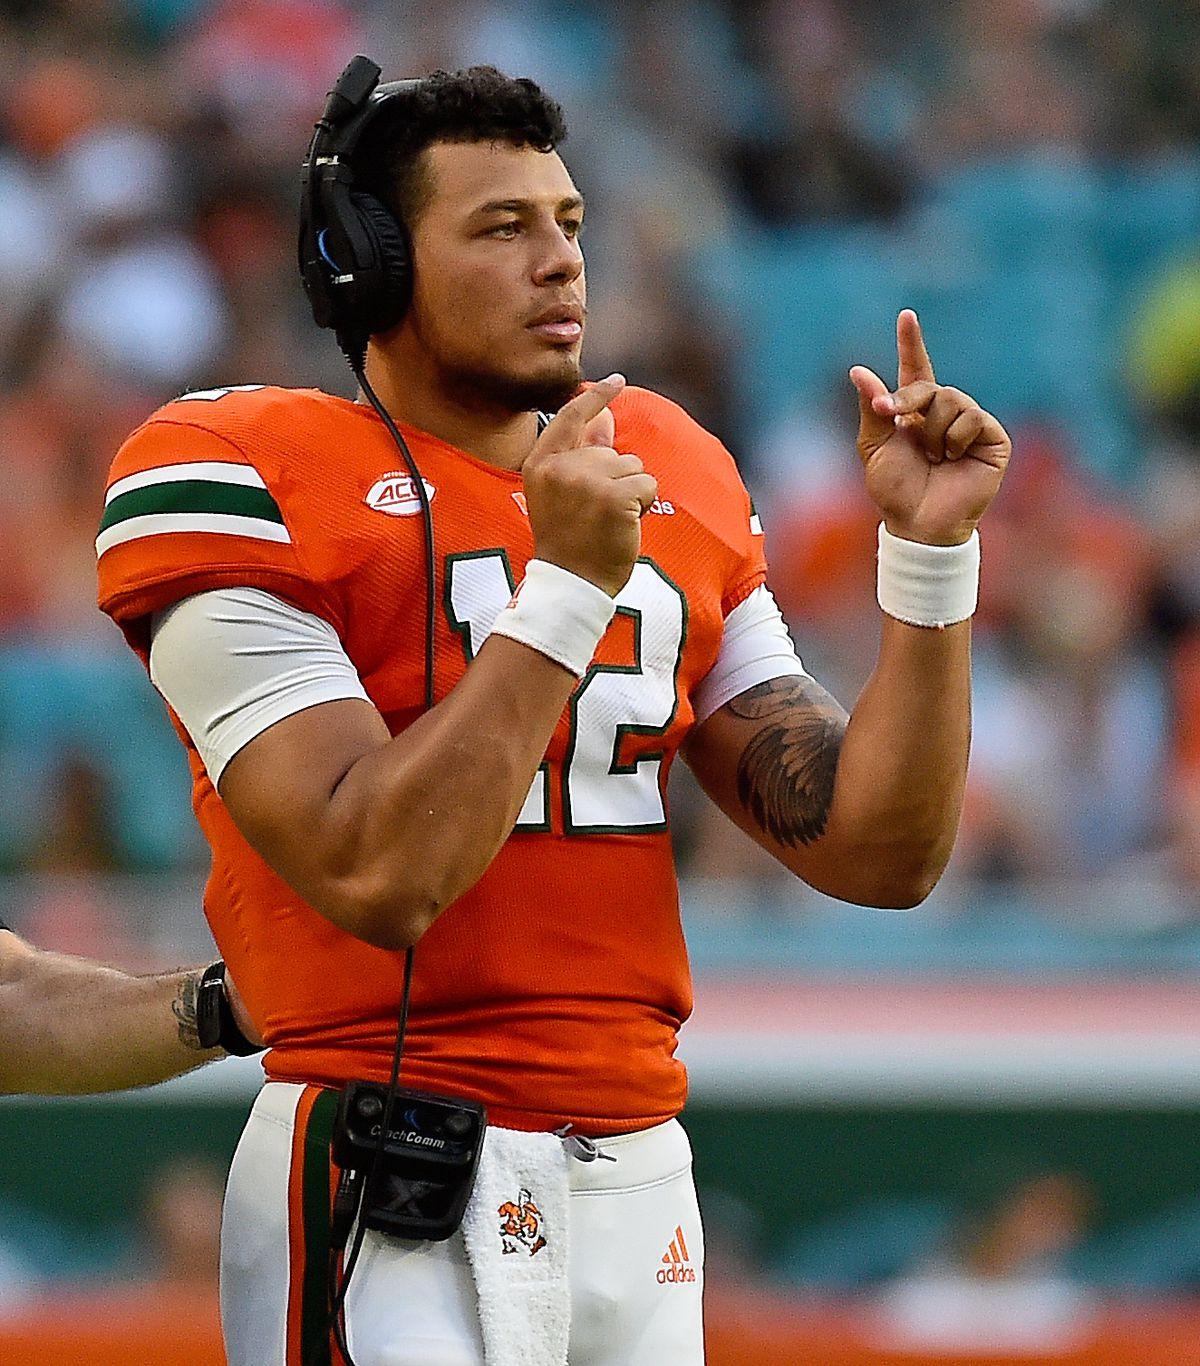 "<p zoompage-fontsize=""15"" style="""">NCAA Football: Florida International at Miami"